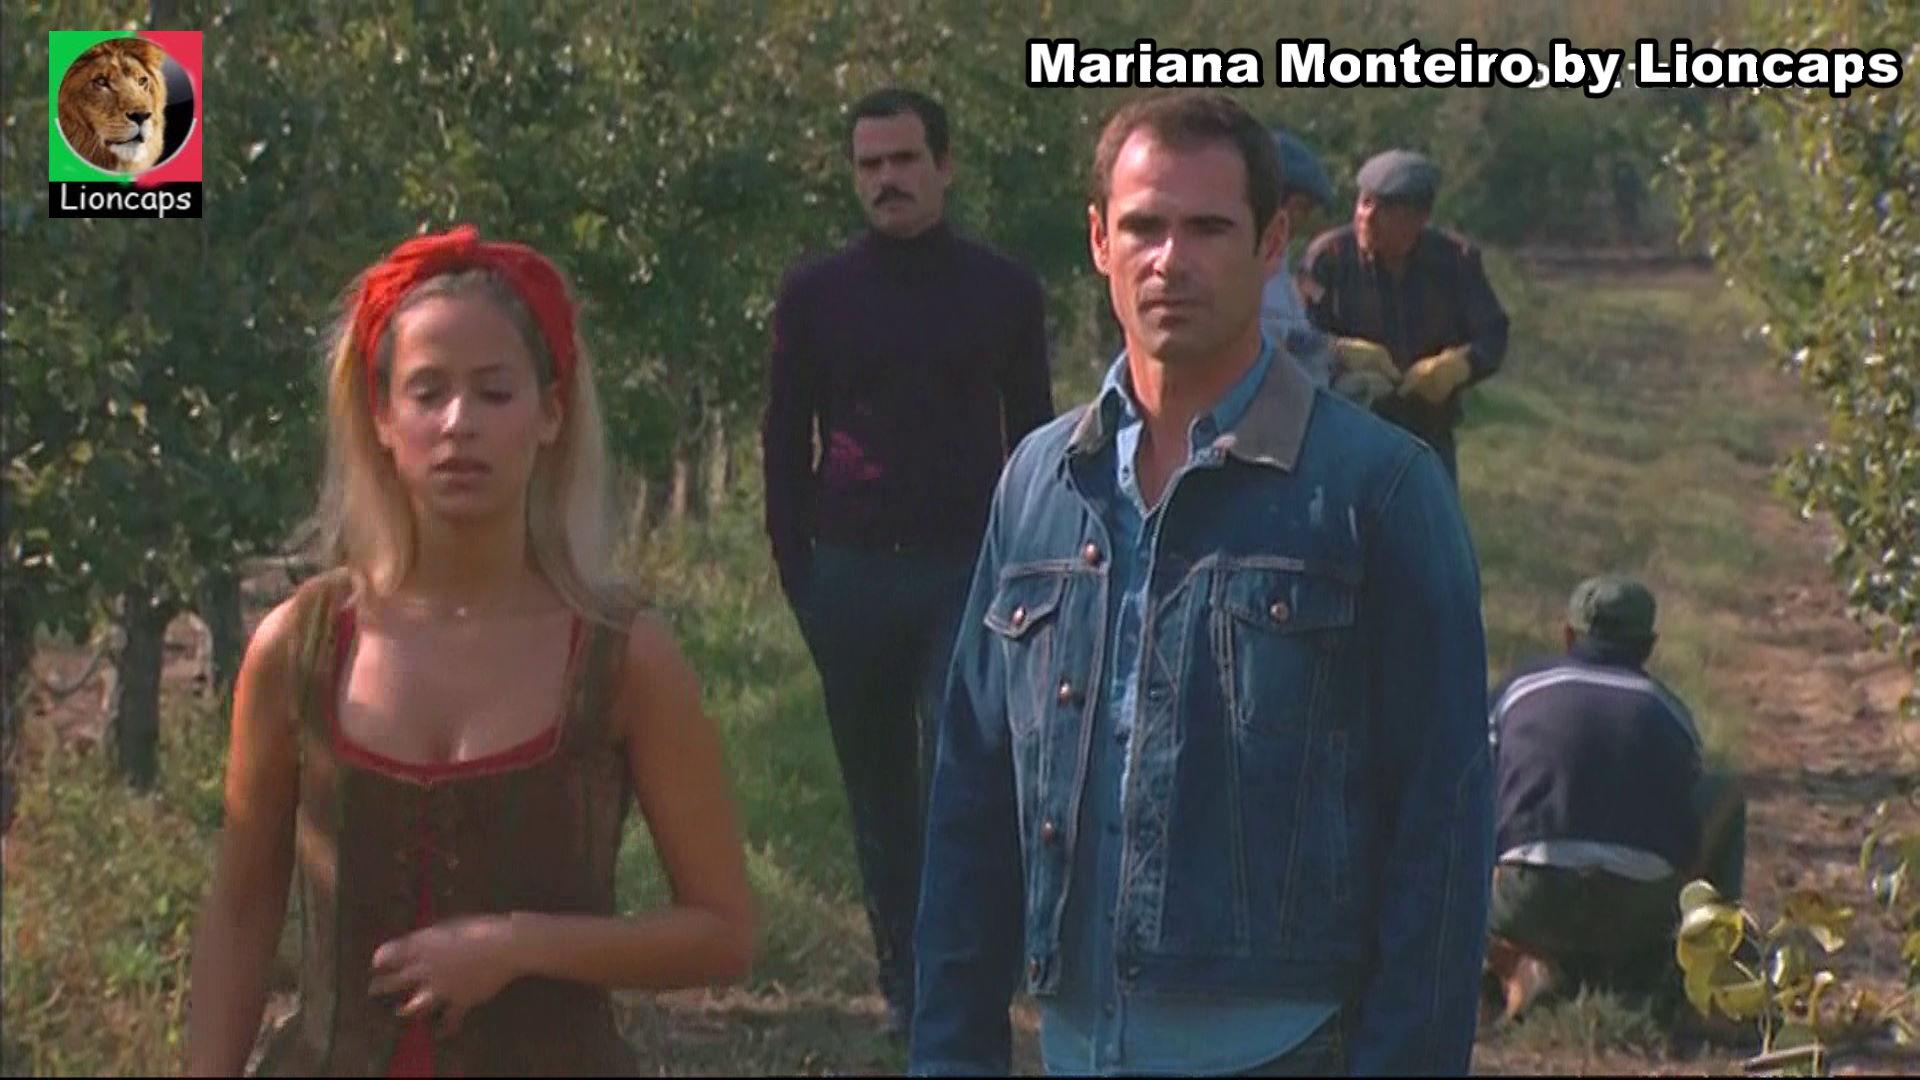 738376326_mariana_monteiro_vs190209_1928_122_343lo.JPG